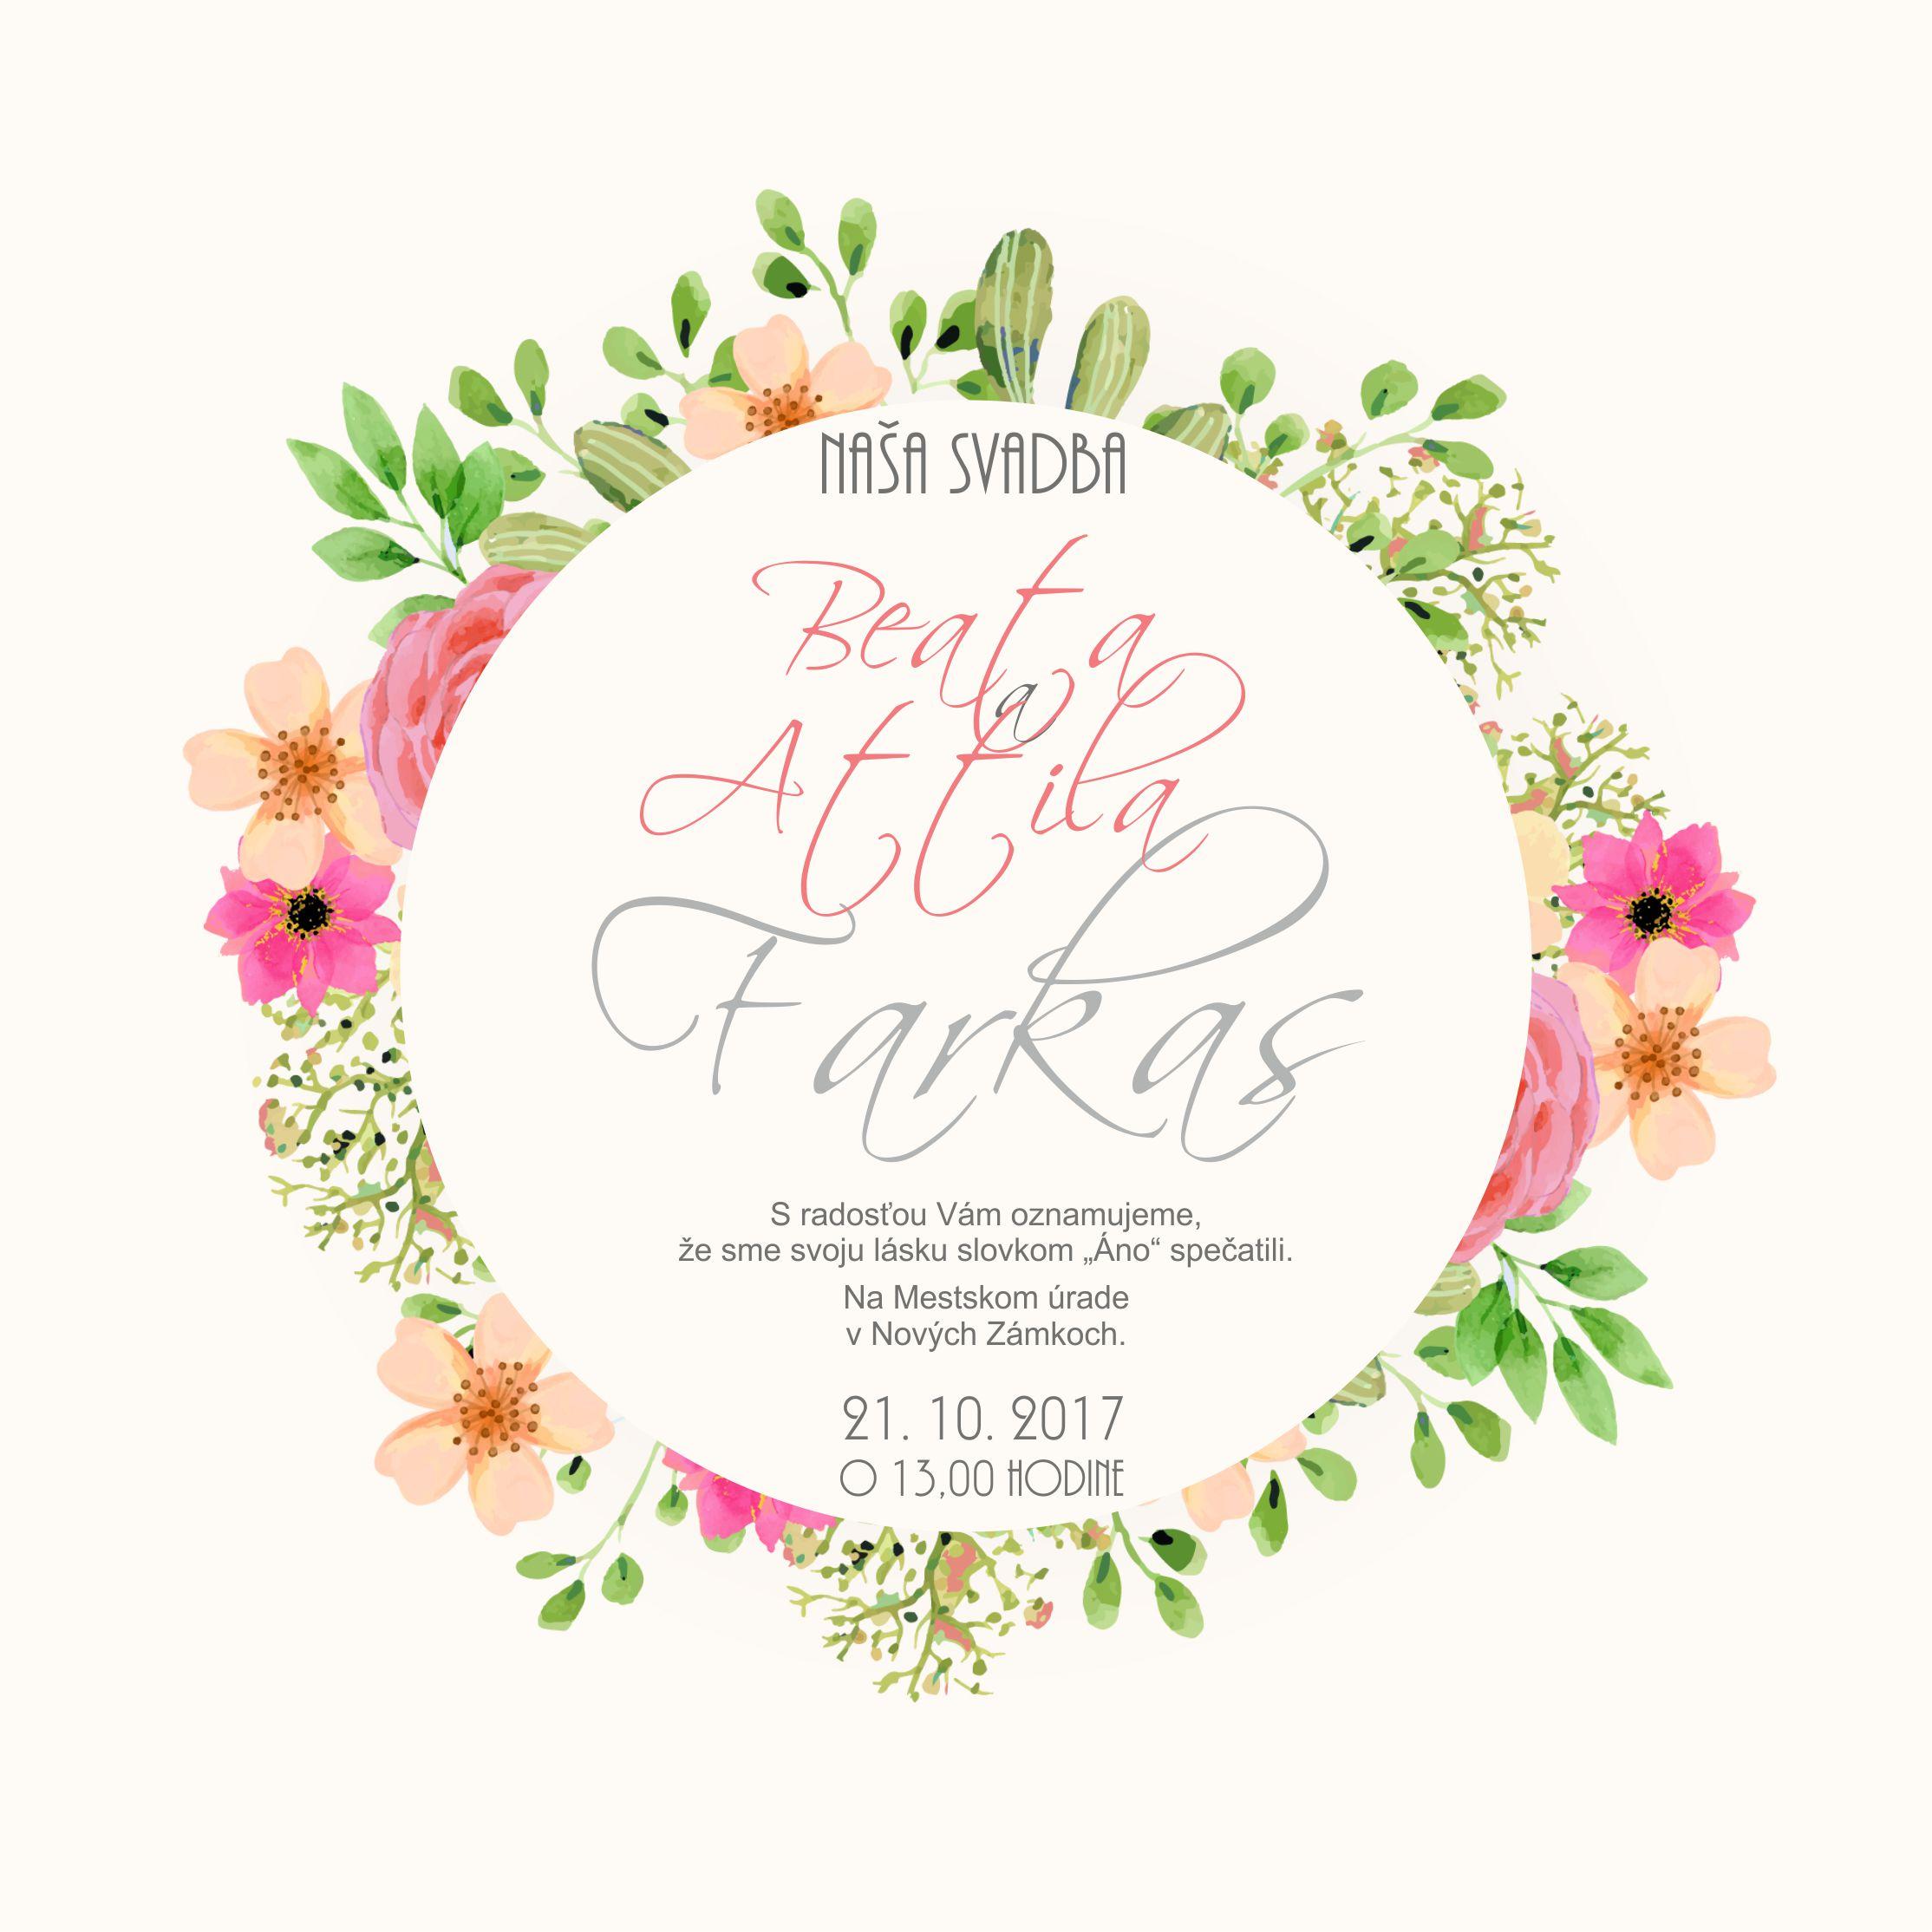 https://dreamevent.sk/wp-content/uploads/2019/01/Oznámenie-Flowers-1.jpg